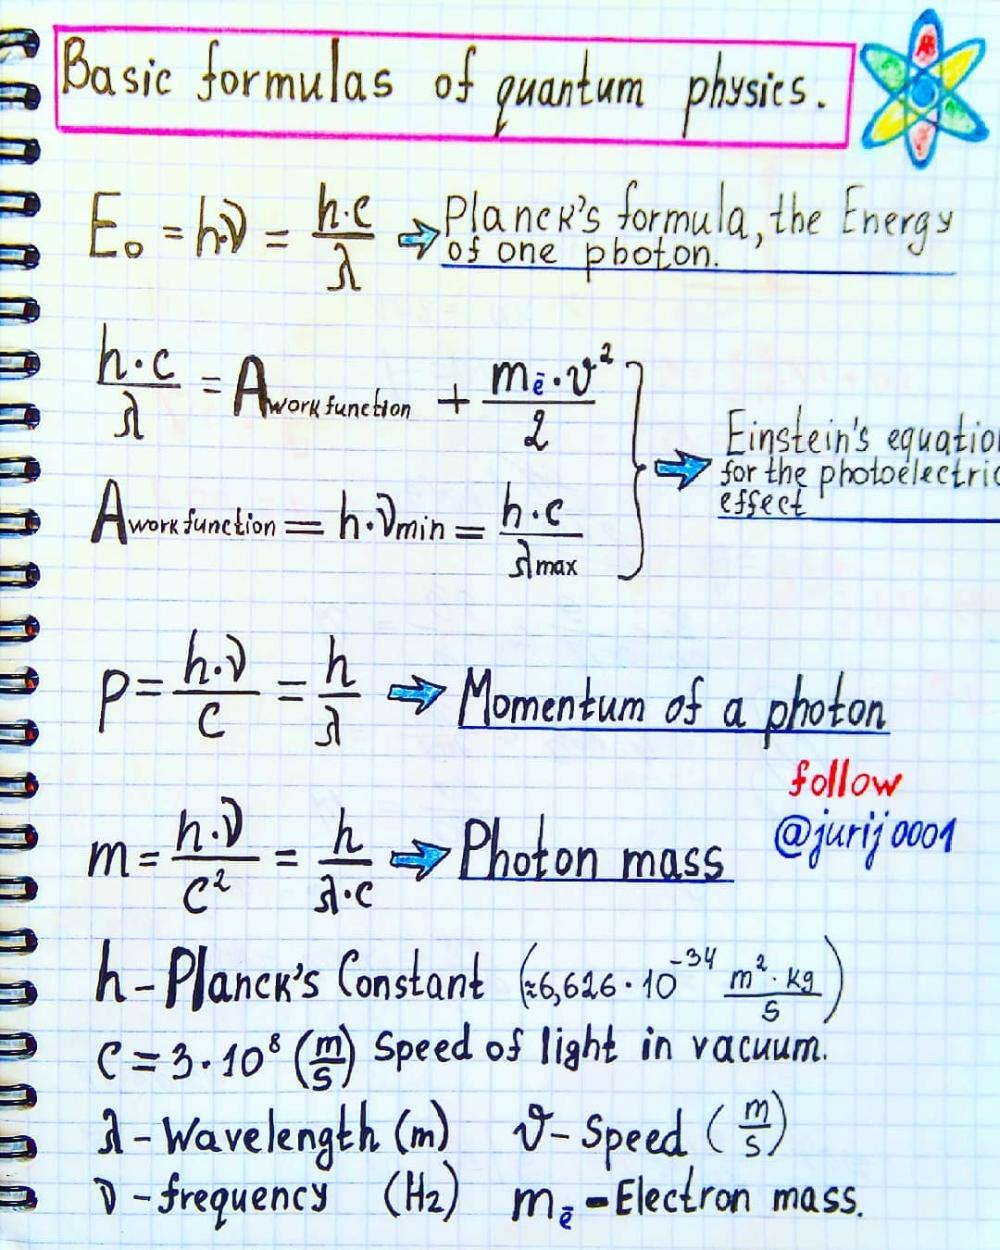 Basic Formulas Of Quantum Physics Illustration By Physics Teacher Yuri Kovalenok Jurij0001 Jurijskov Quantum Physics Physics Physics And Mathematics